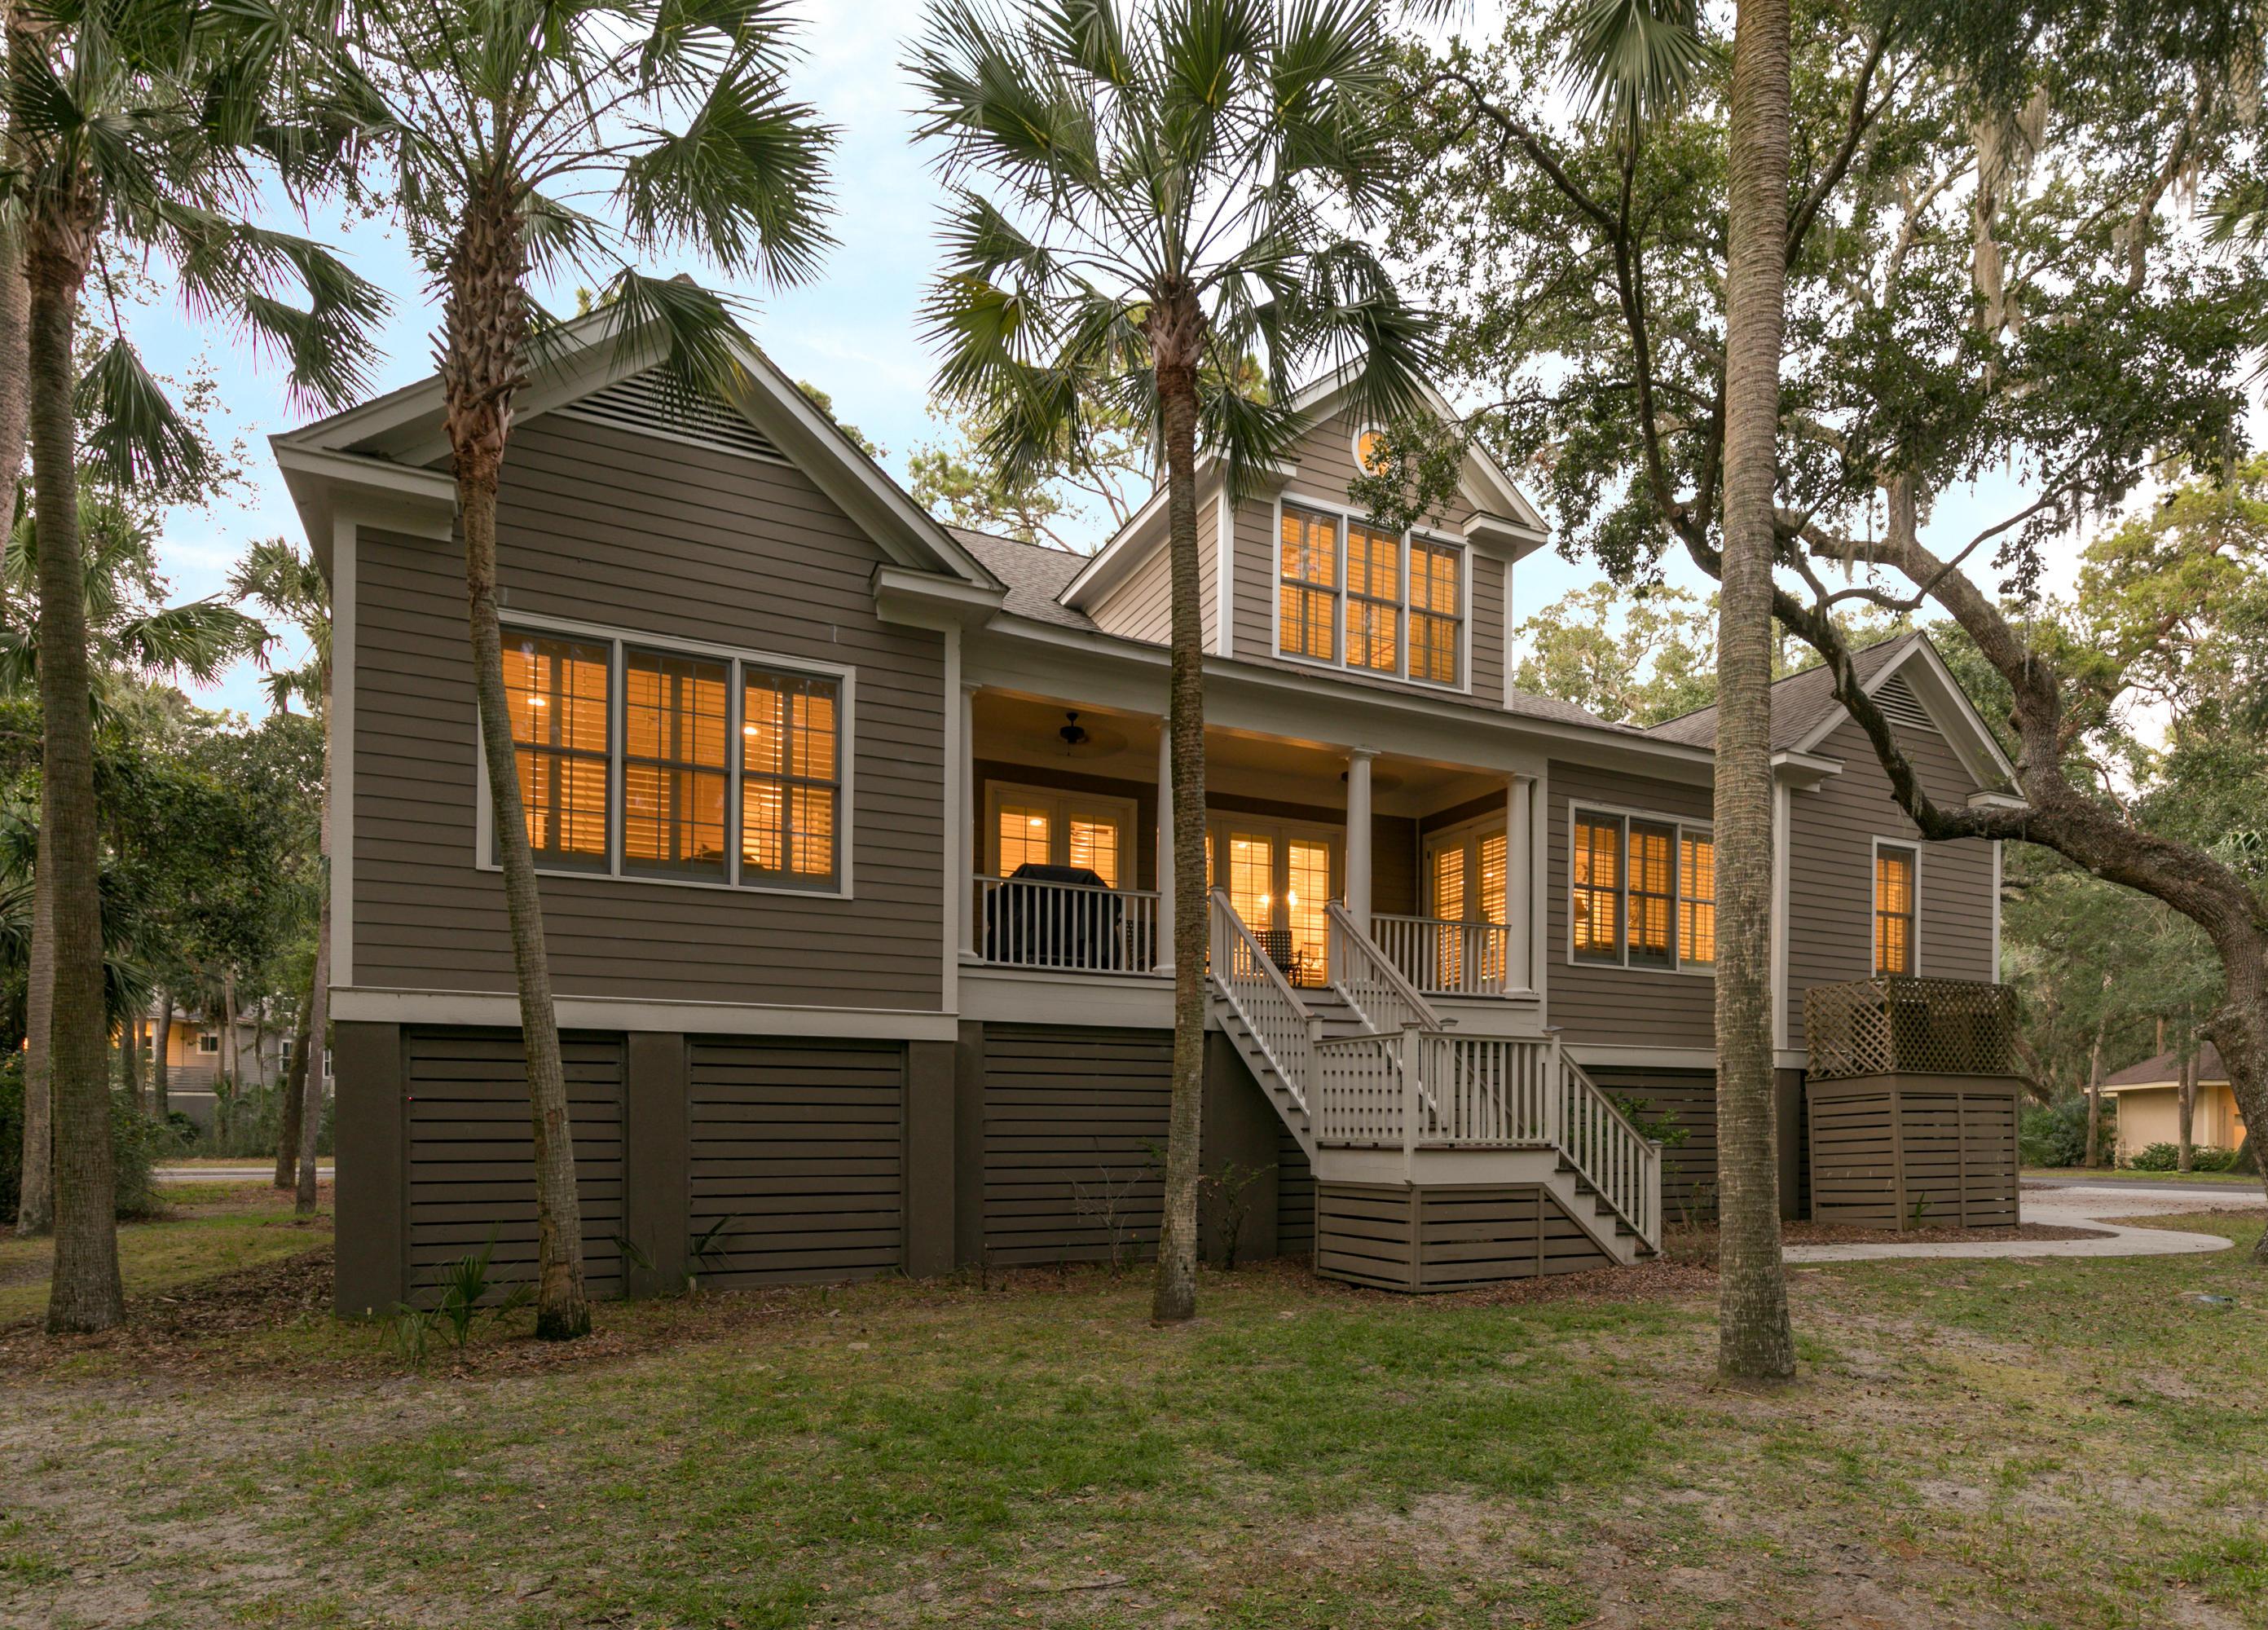 Seabrook Island Homes For Sale - 2701 Seabrook Island, Seabrook Island, SC - 16